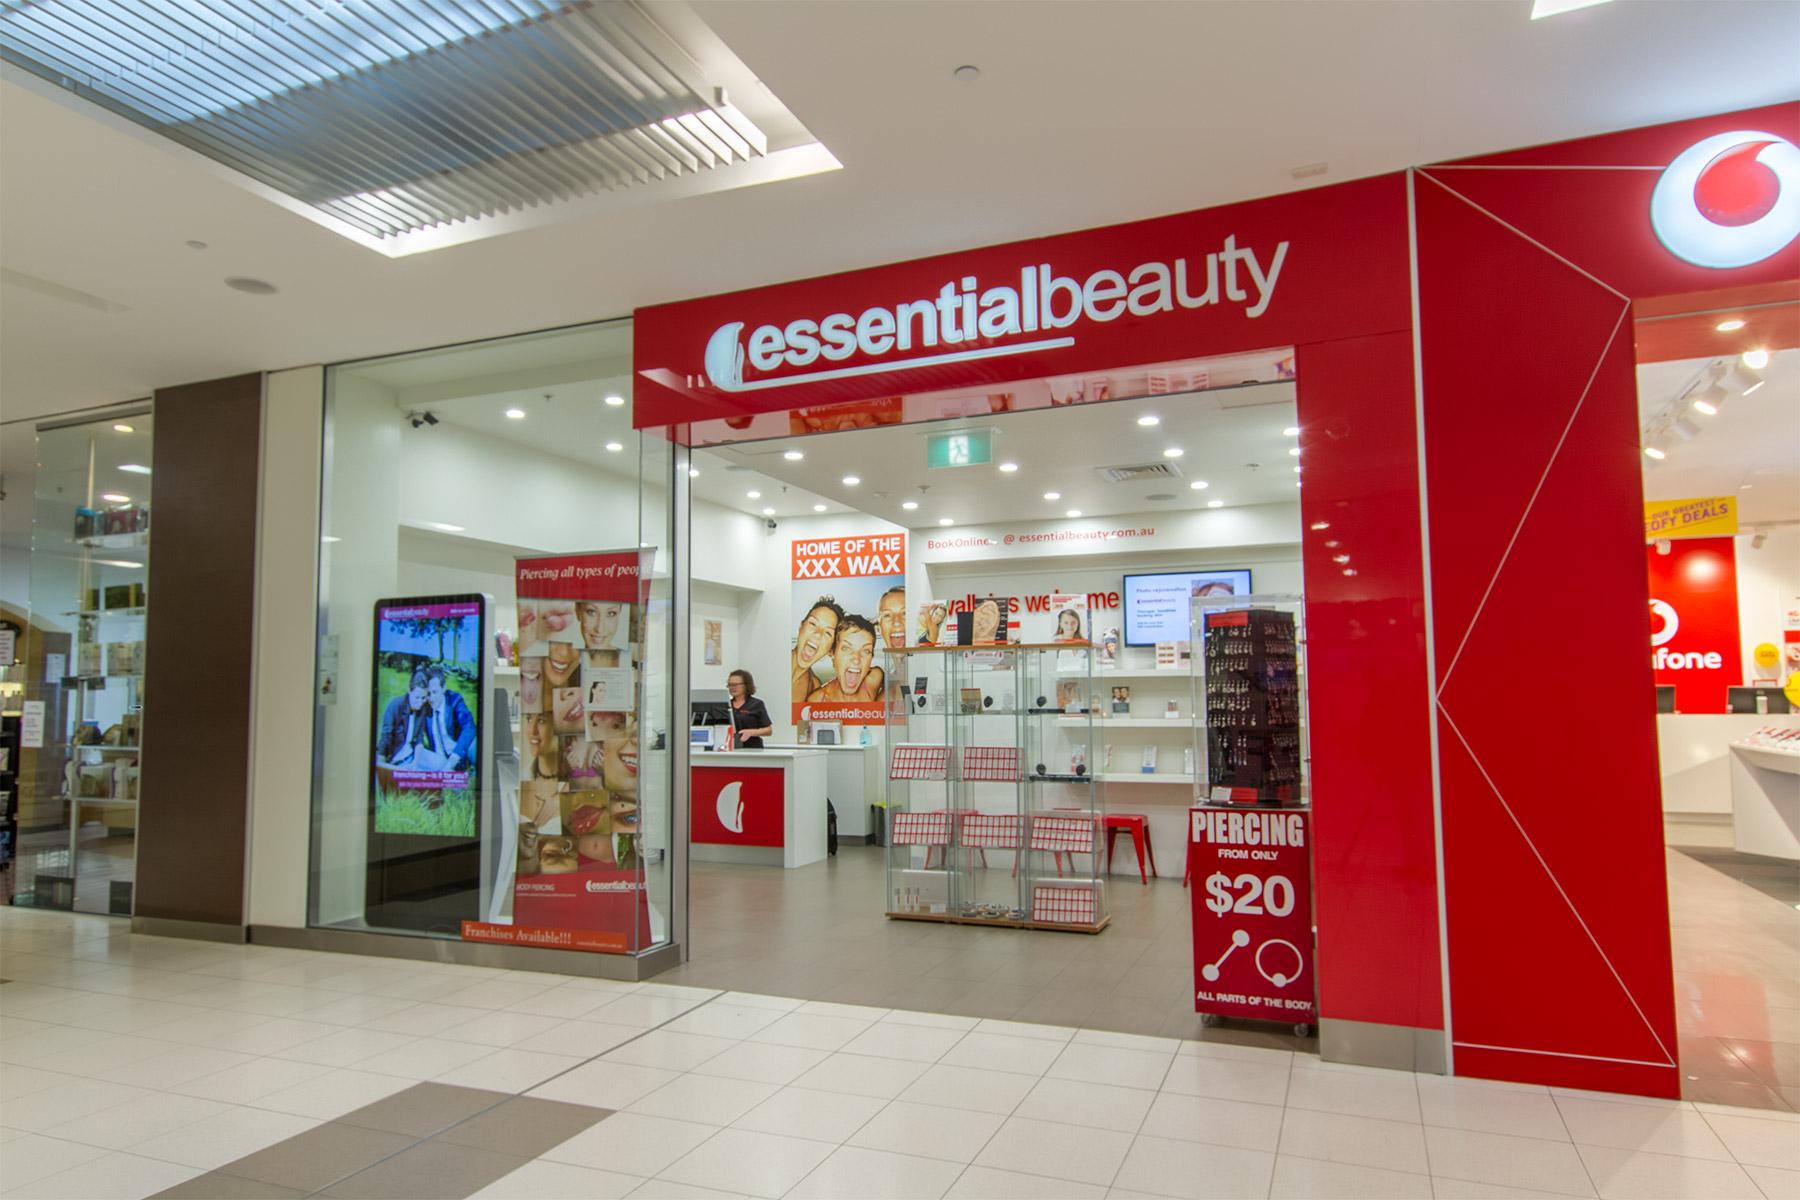 BONDI JUNCTION Essential Beauty Salon Franchise Opportunity - Be your own Boss!